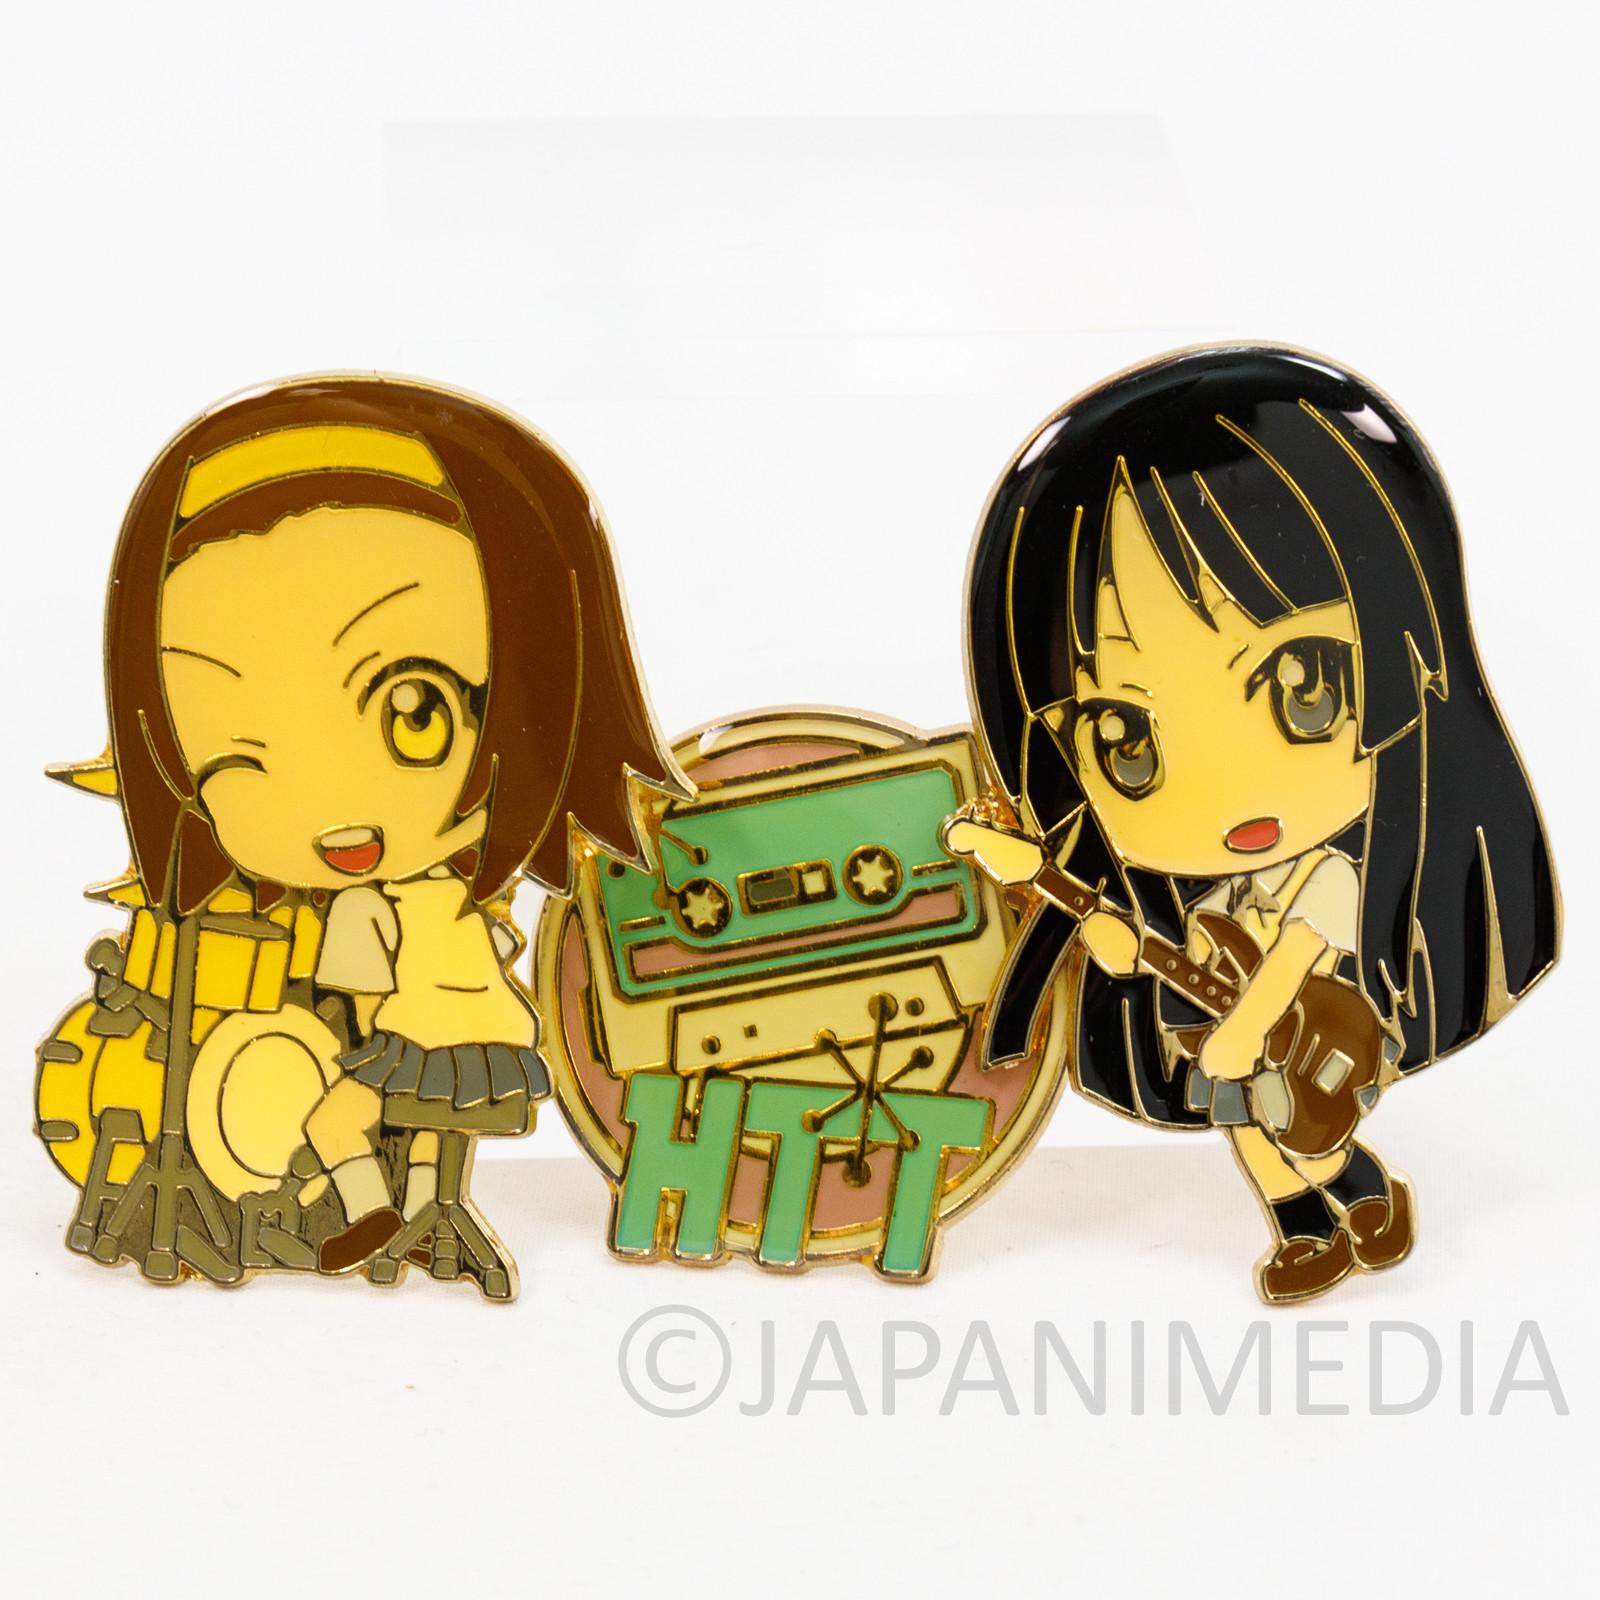 K-ON! Mio Akiyama & Ritsu Tainaka Metal Pins Set JAPAN KYOTO ANIMATION